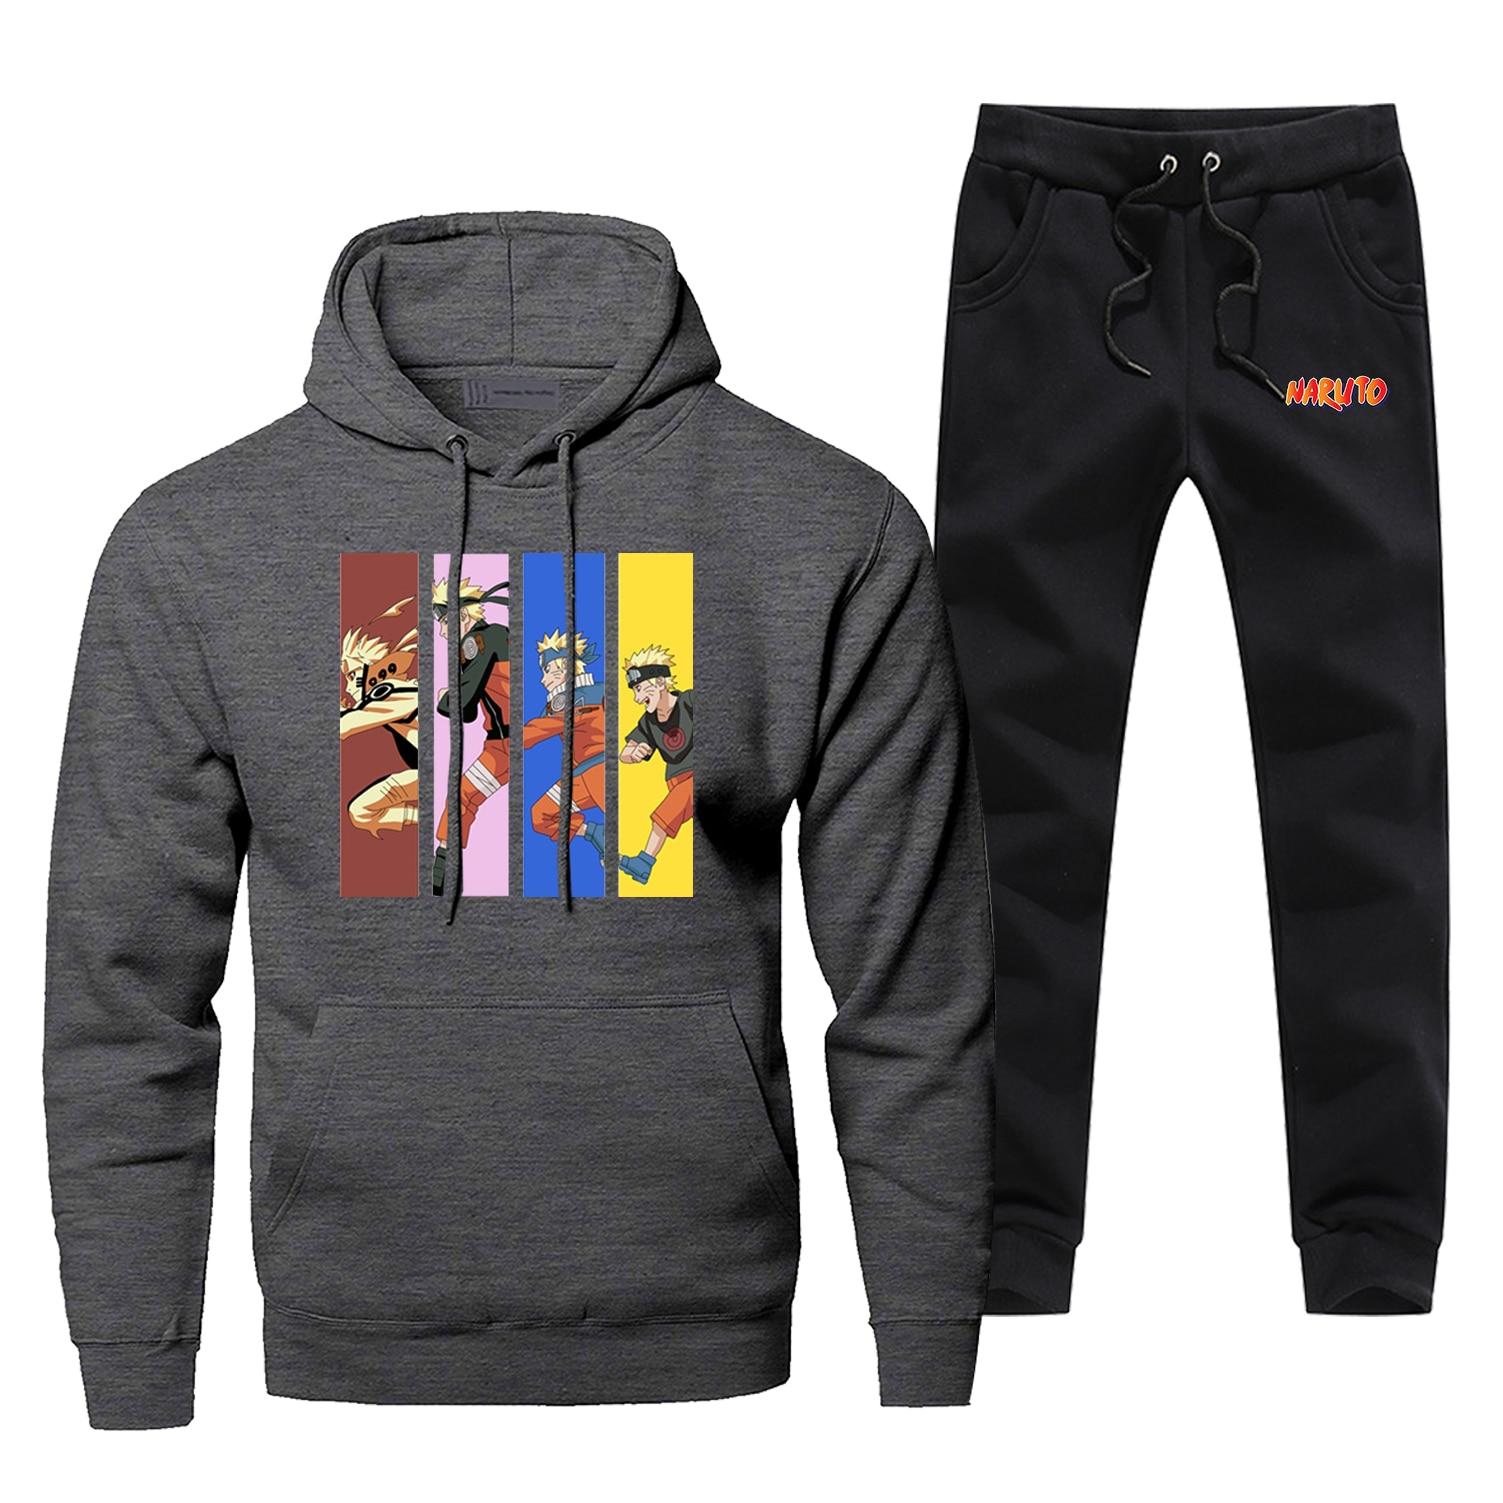 Japan Anime Uzumaki Naruto Running Sweatshirt Tracksuit Hoodies+pants Sets Mens Funny Harajuku Streetwear Sportswear Sweatpants